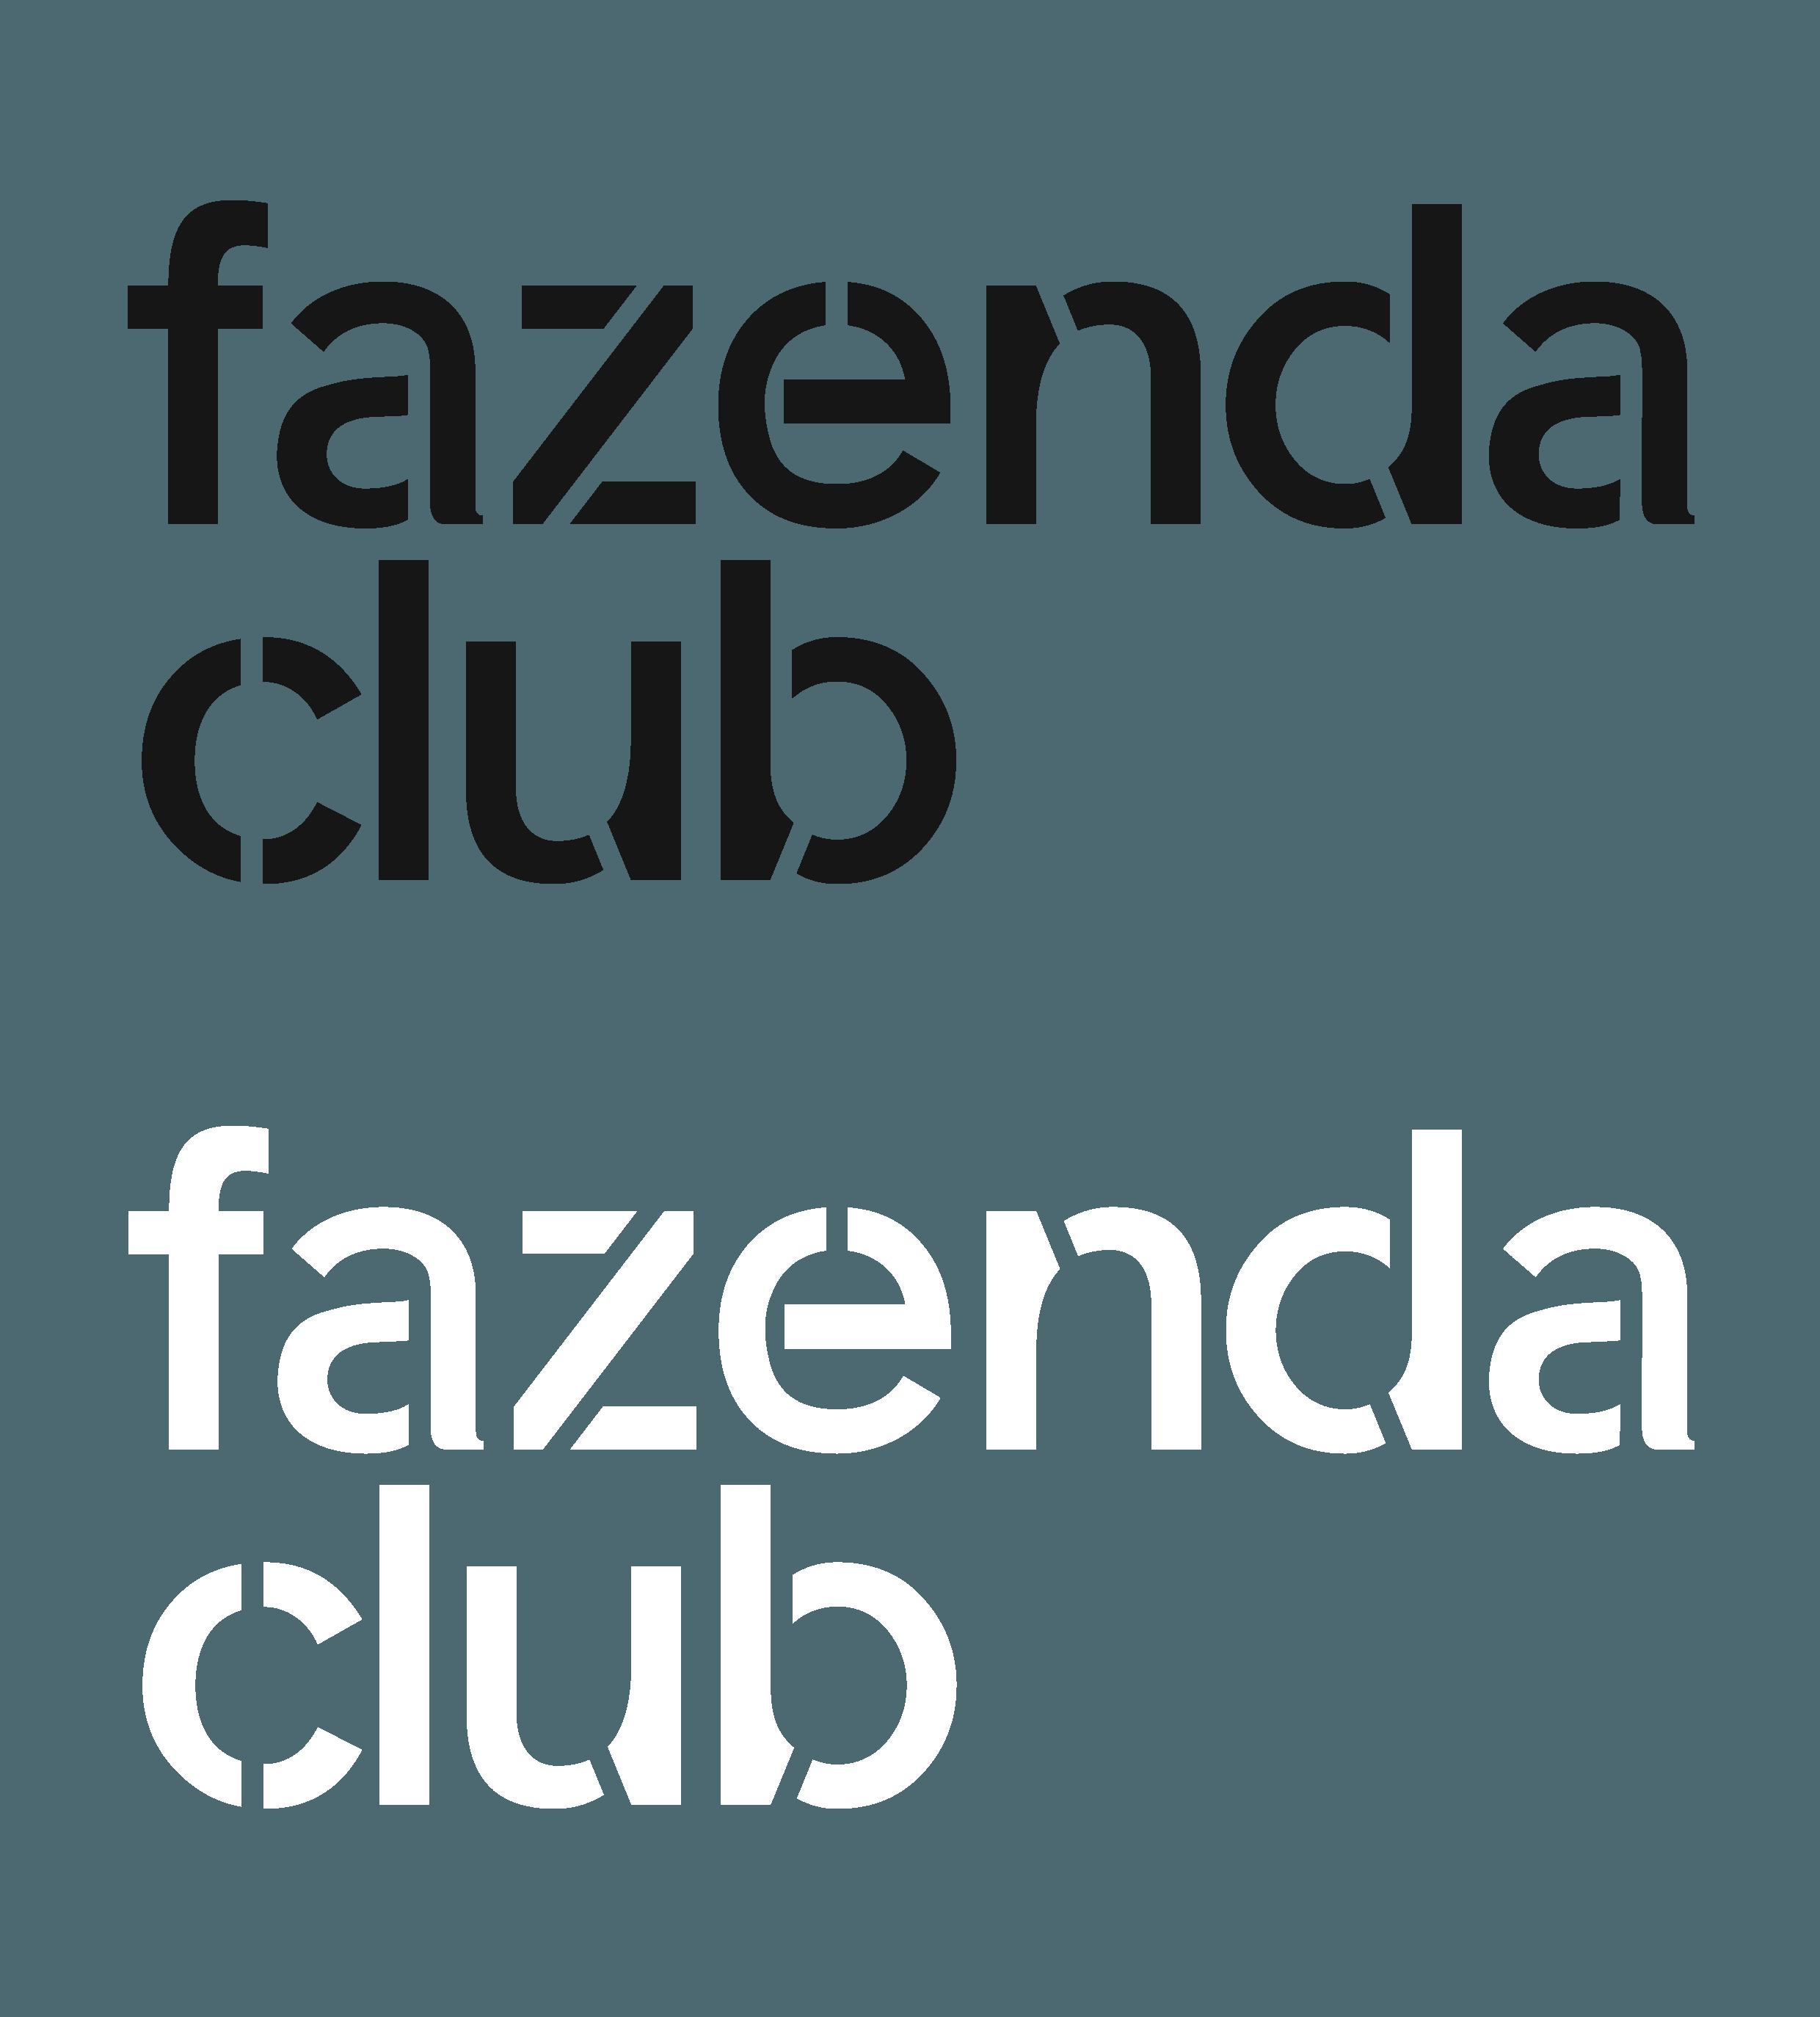 Fazenda Club